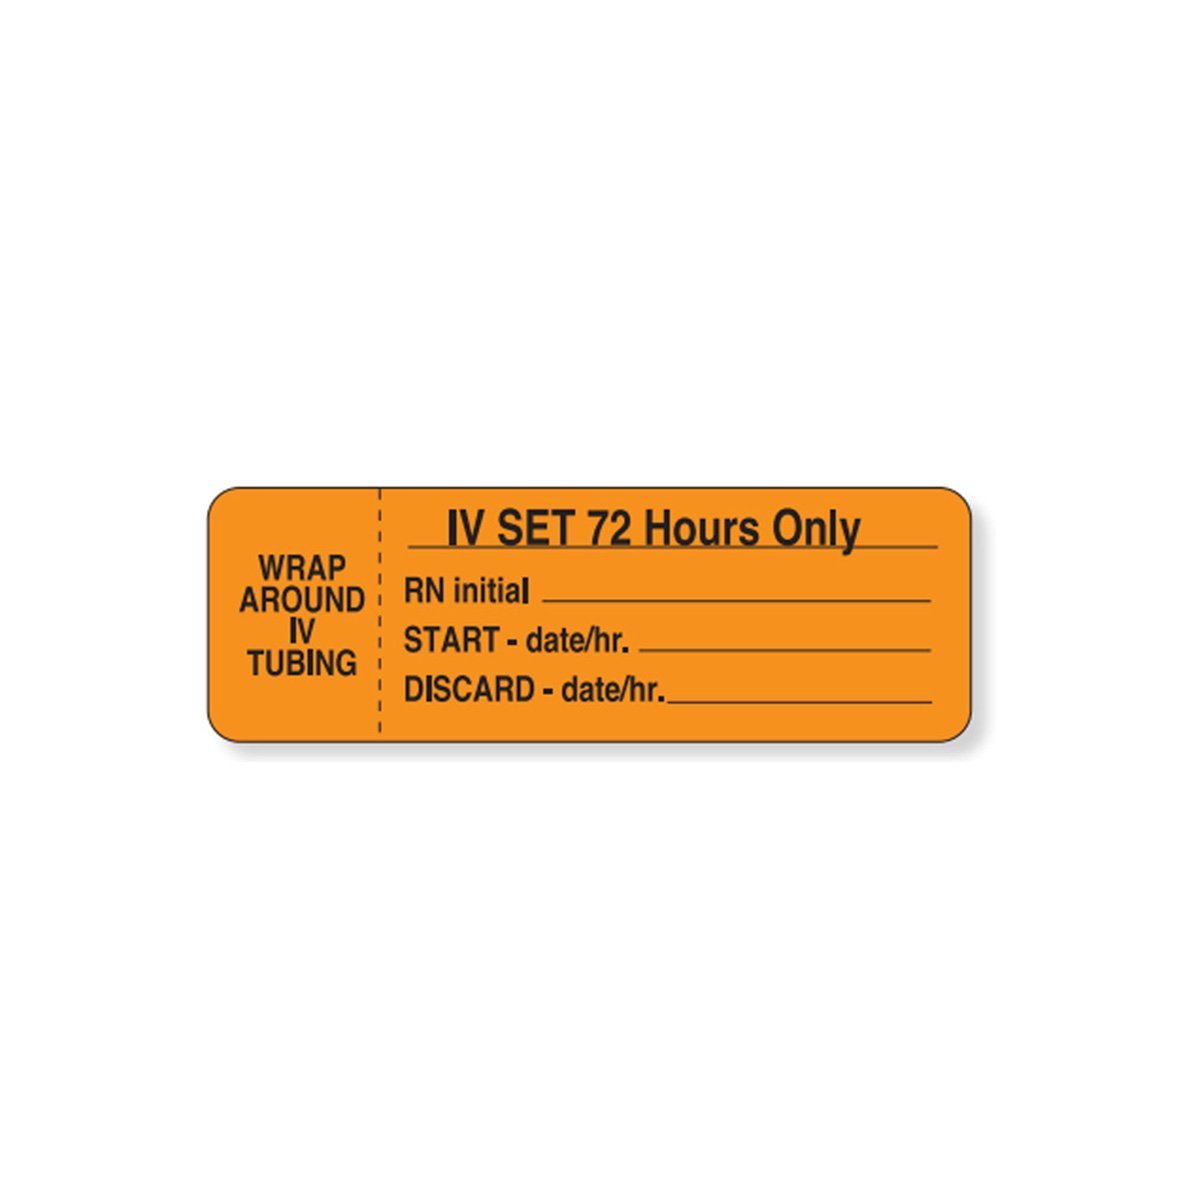 PDC Healthcare 59704478 IV Label, Wraparound Paper, Permanent Wrap, I.V. Set 72, 1'' 1/2'' Core, 3'' x 1'', Orange (Pack of 1000)